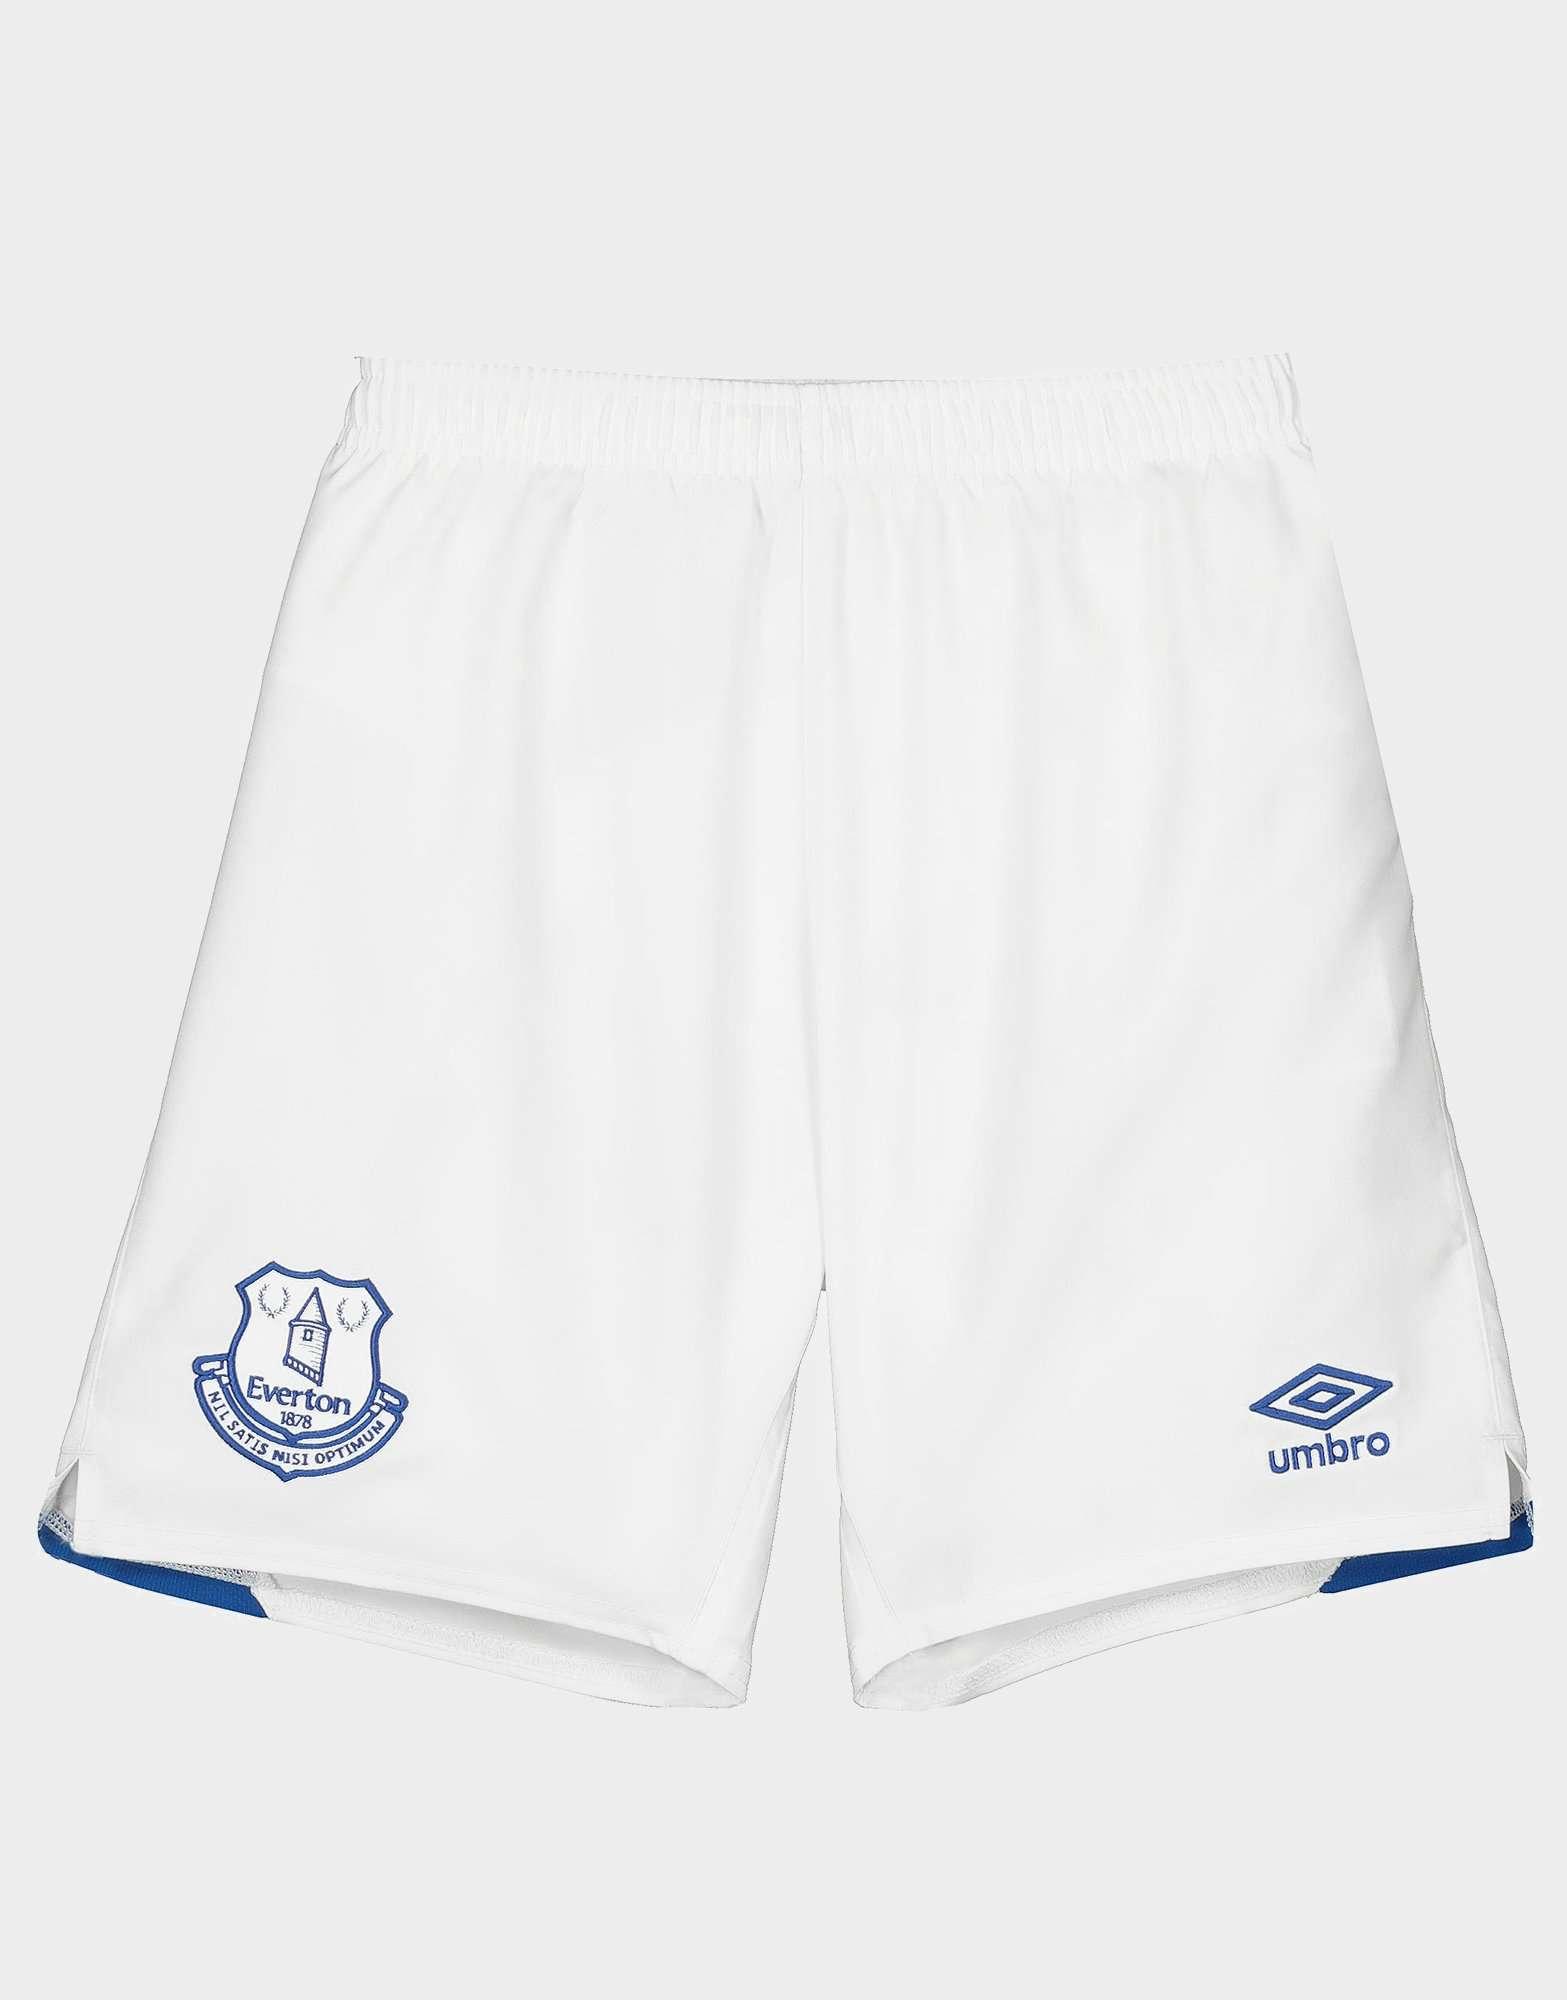 Umbro Everton FC 201920 Home Shorts Junior | JD Sports